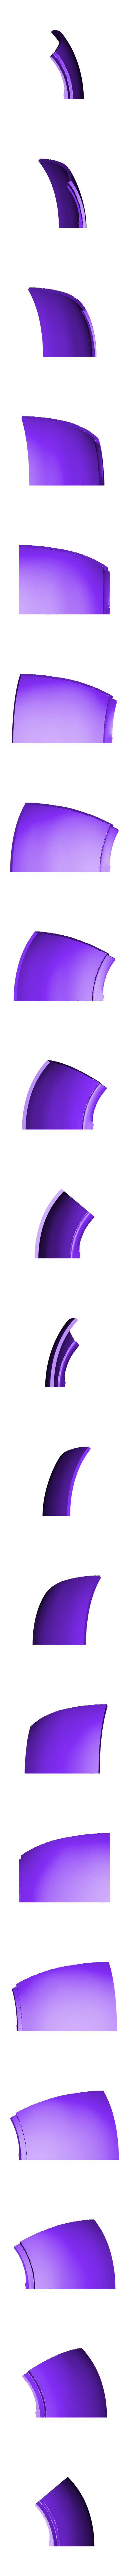 Sniper_Final_Print20.stl Download OBJ file Sniper - Knights of Ren Helmet mask, Star Wars 3D print model • 3D printable model, 3D-mon